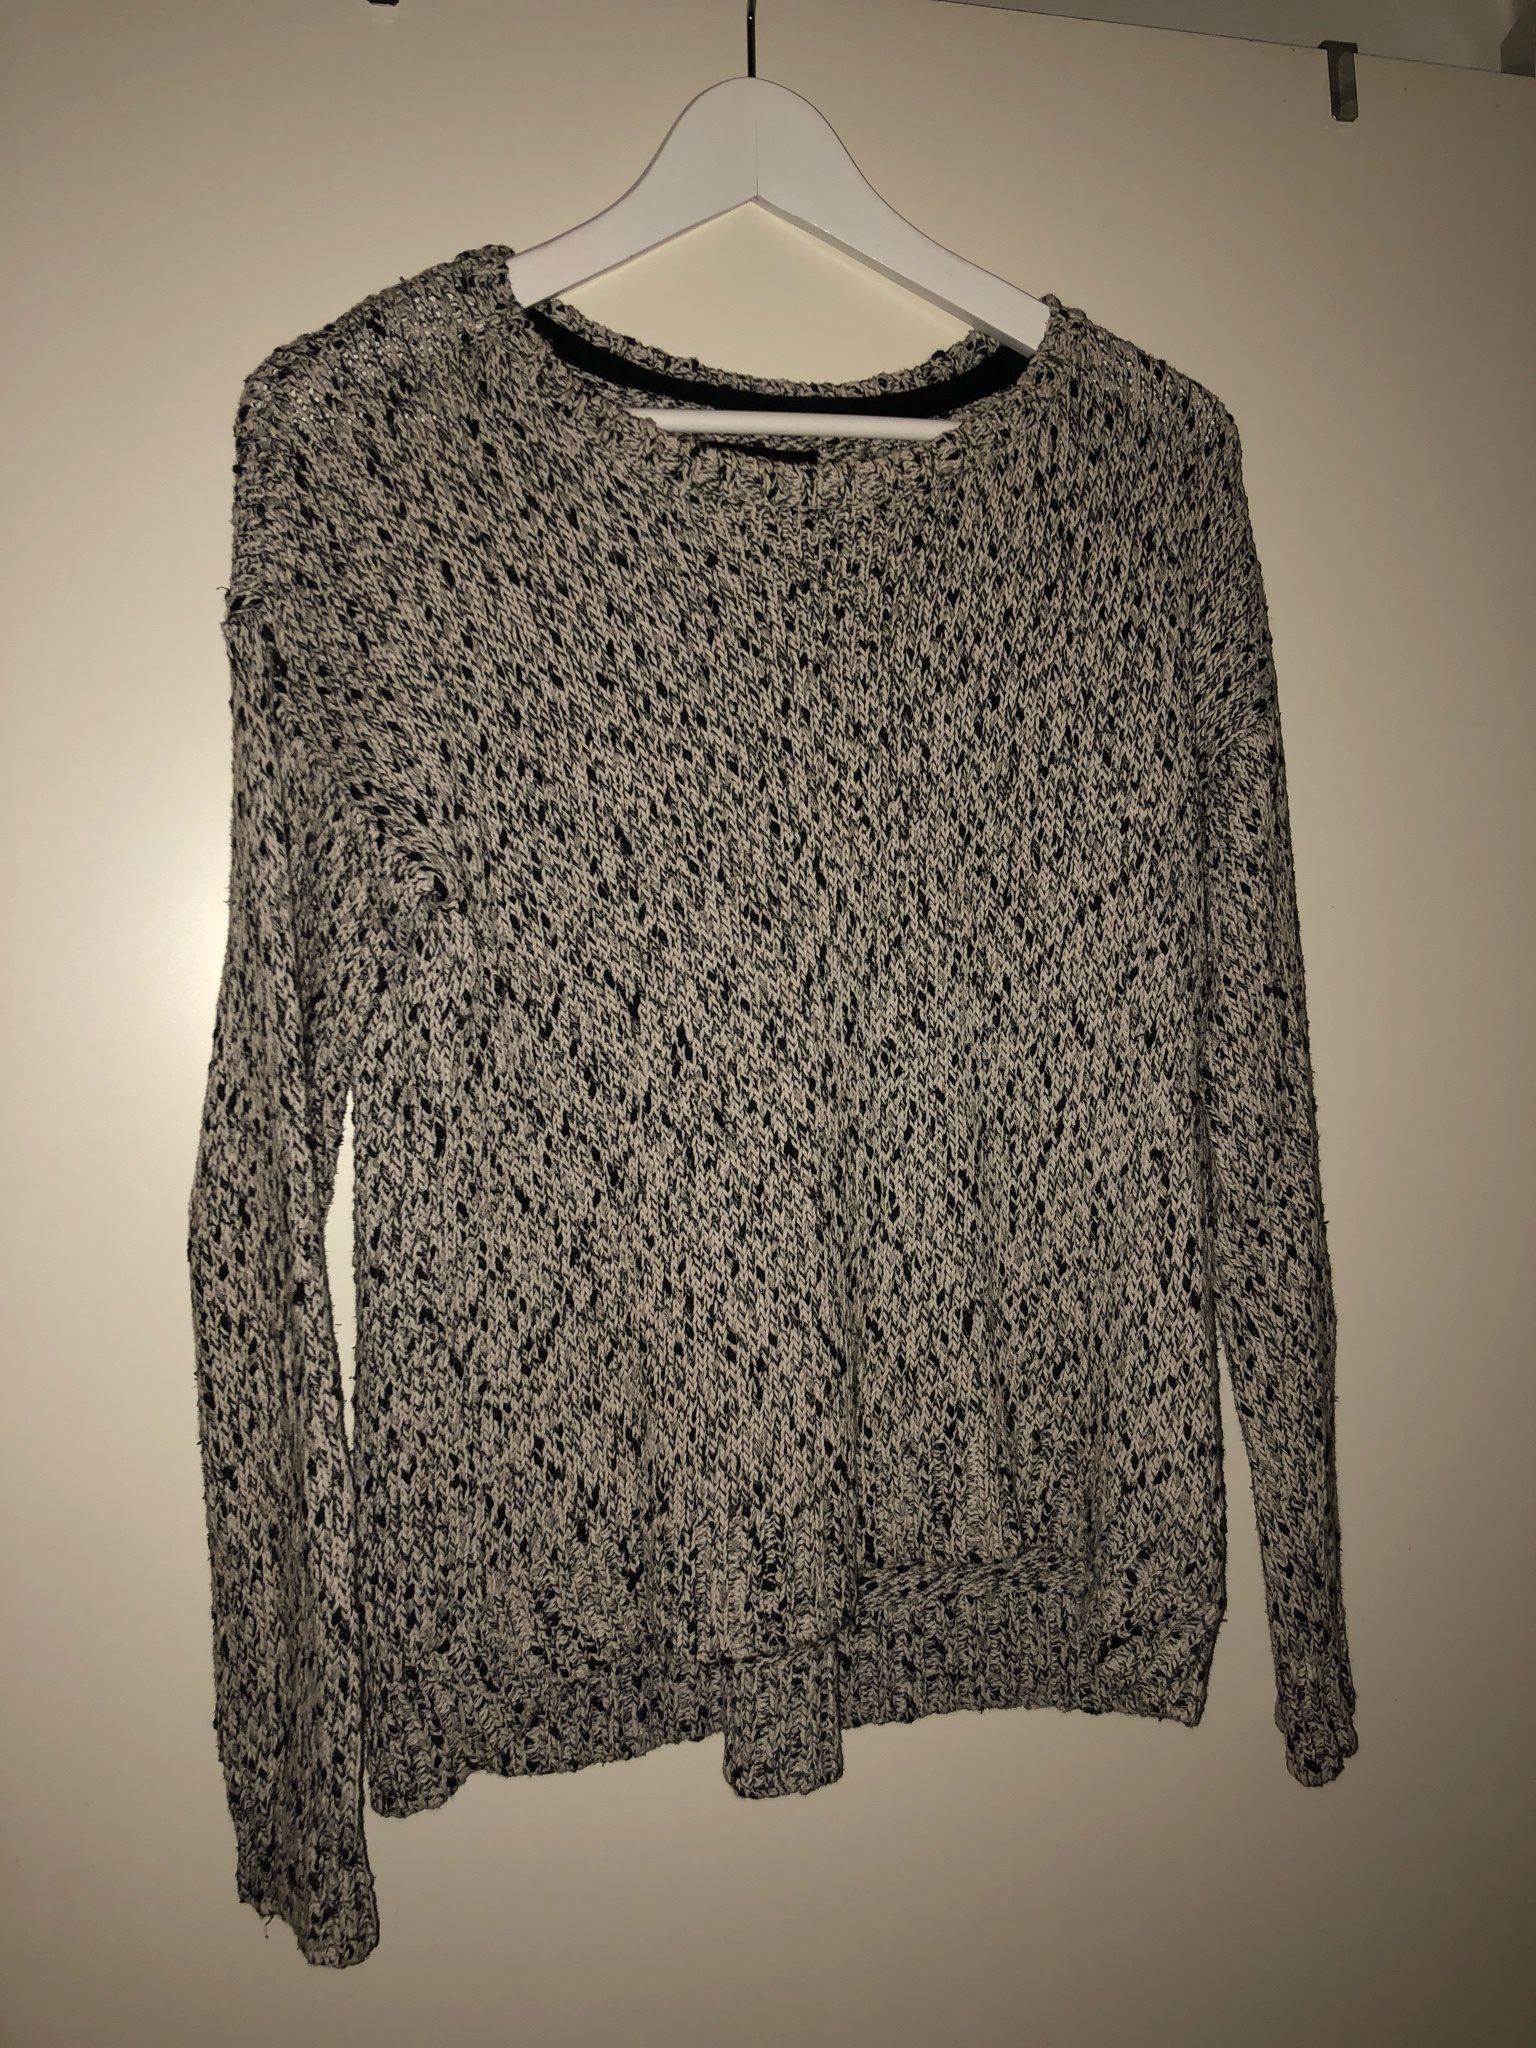 svart och vit stickad tröja